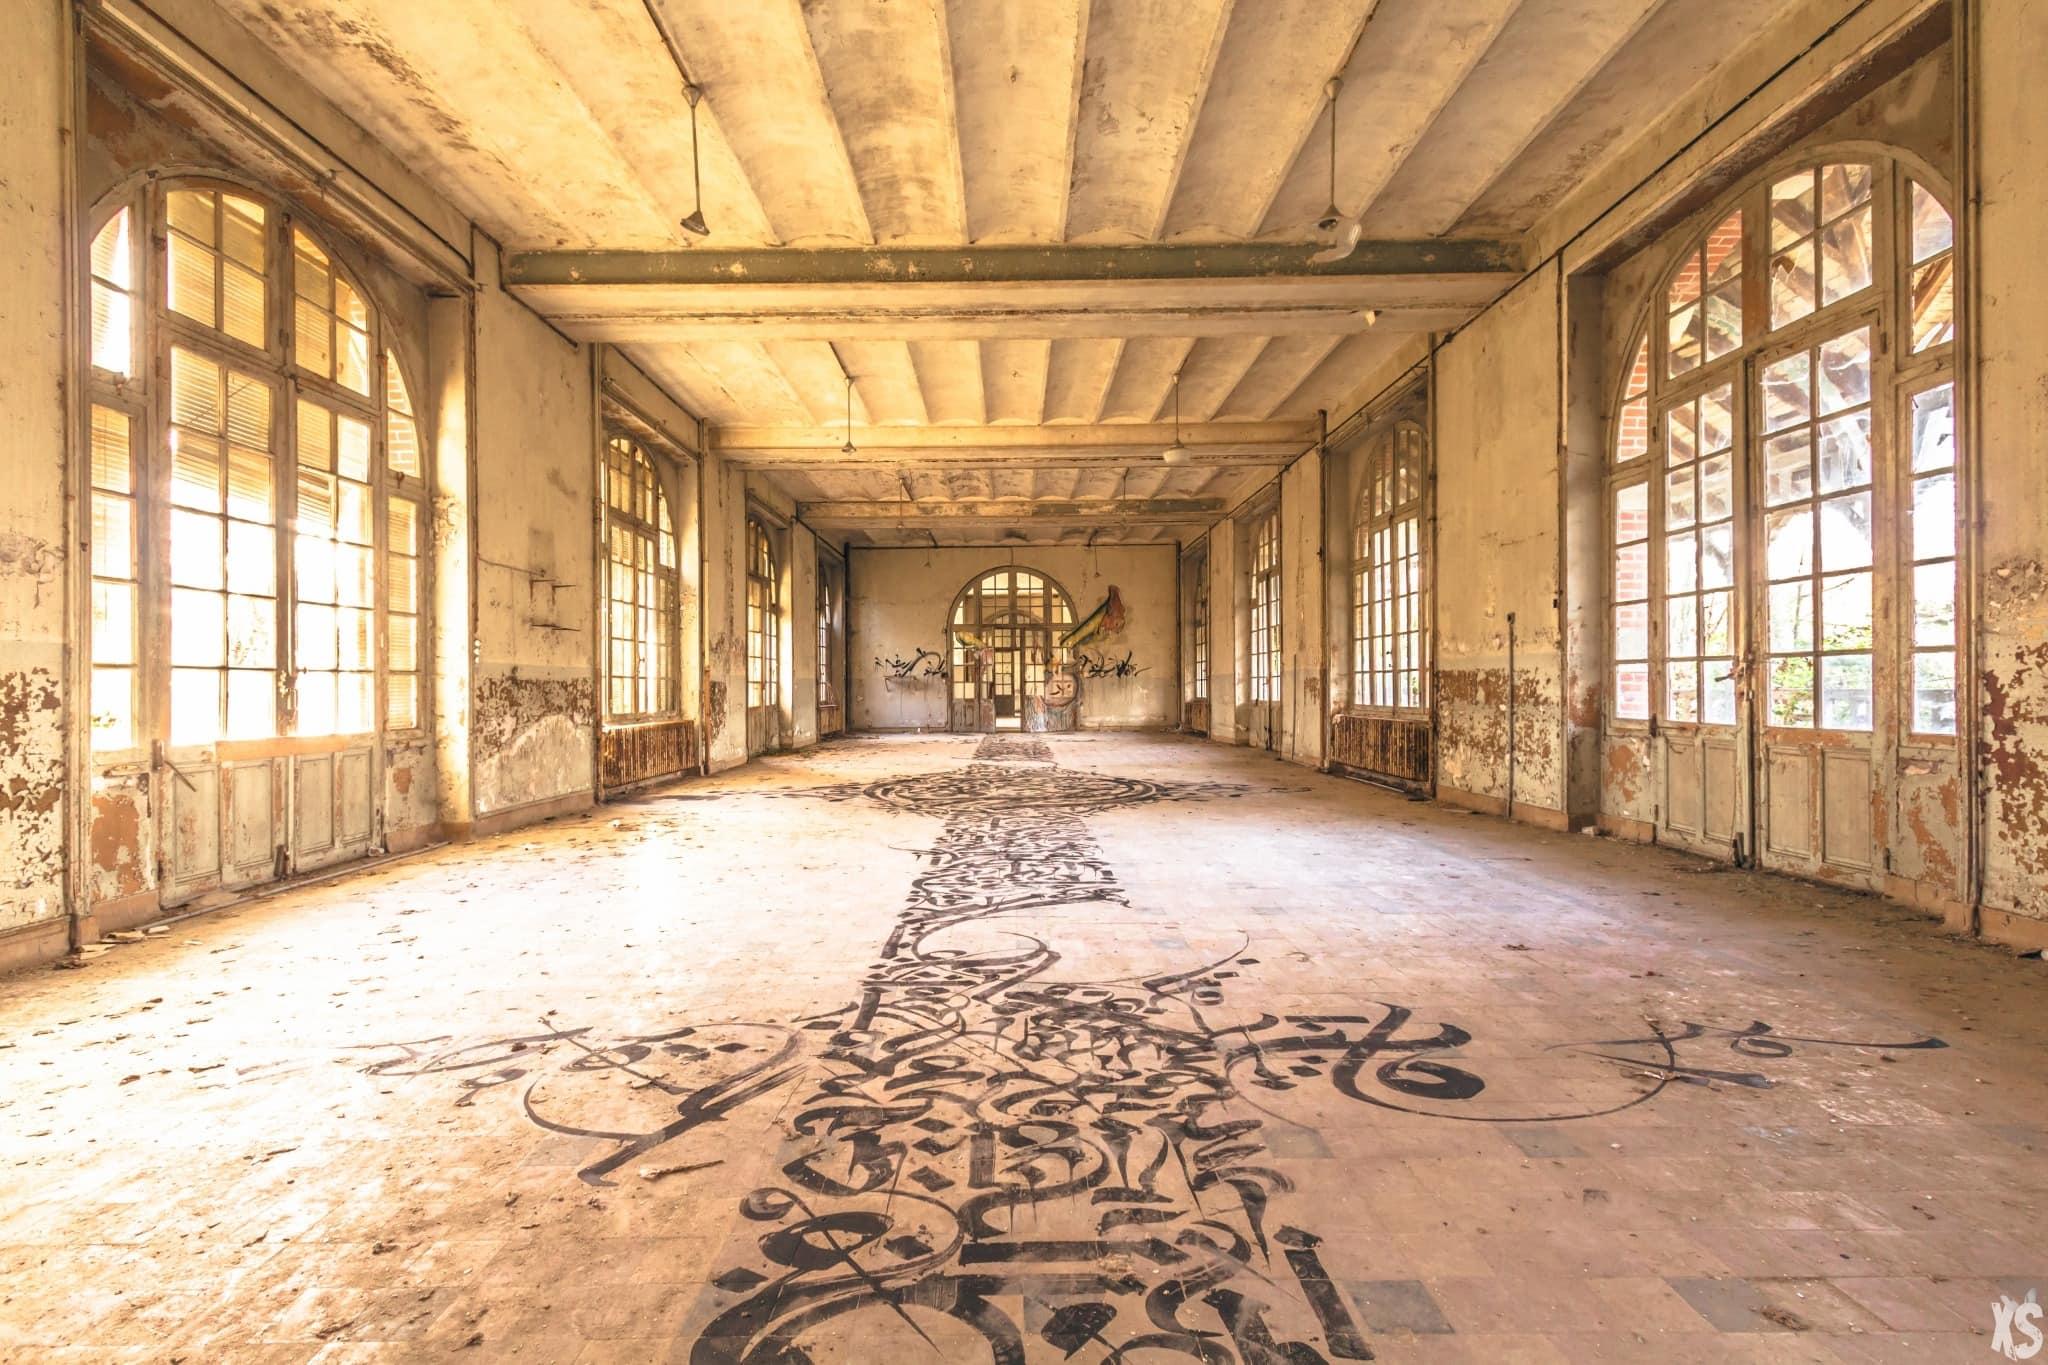 Abandoned orphanage in France | urbexsession.com/en/emile-louis-orphanage | Urbex France